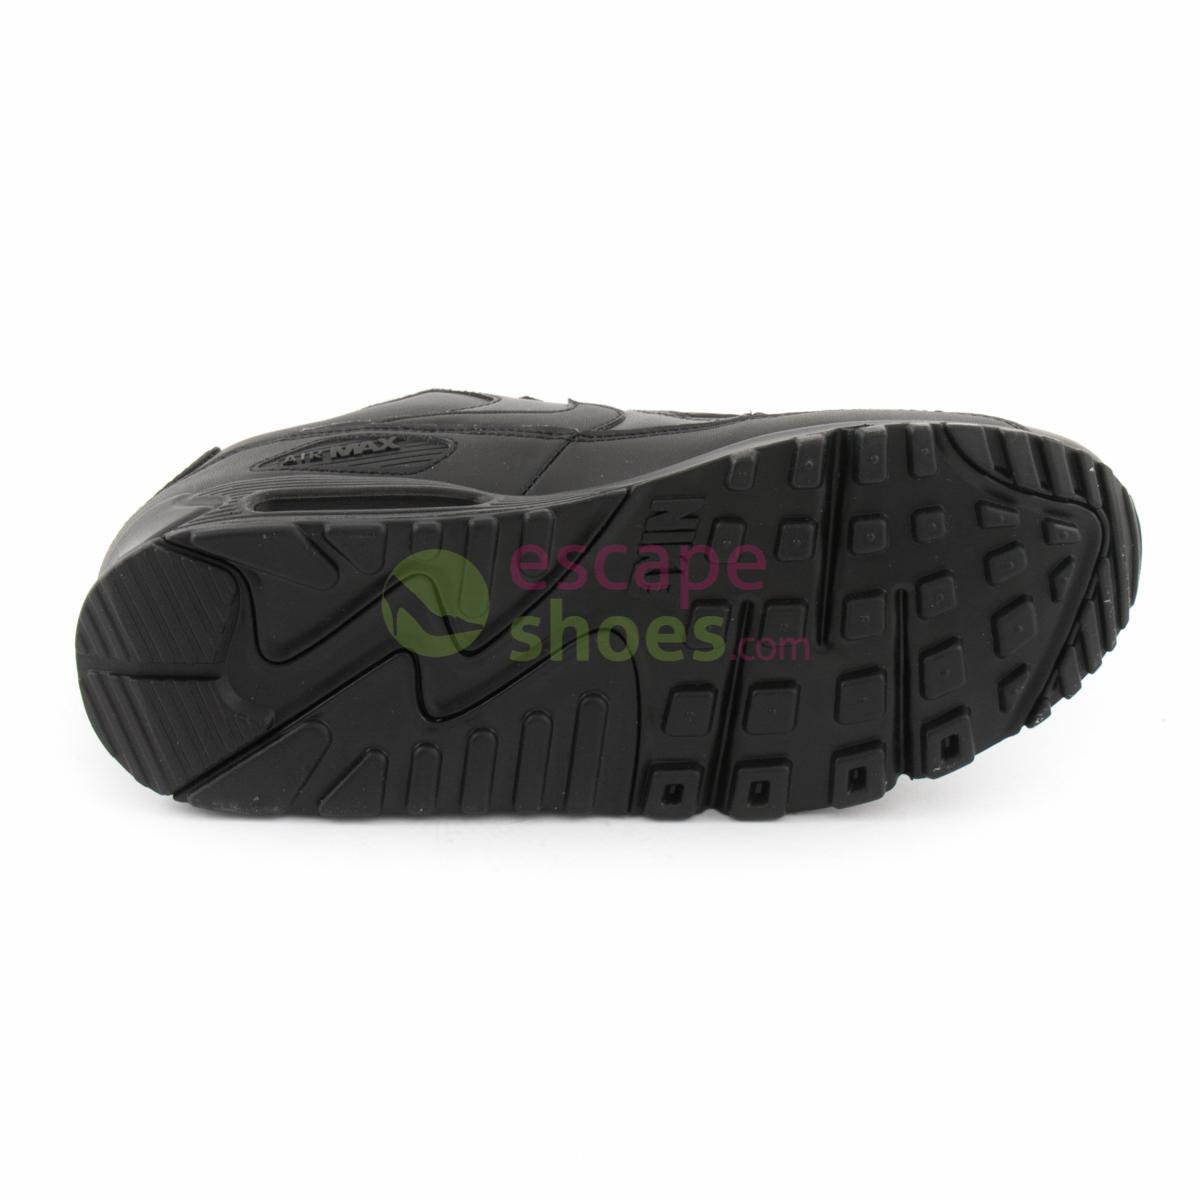 NIKE Air Max 90 Leather Black 302519 001